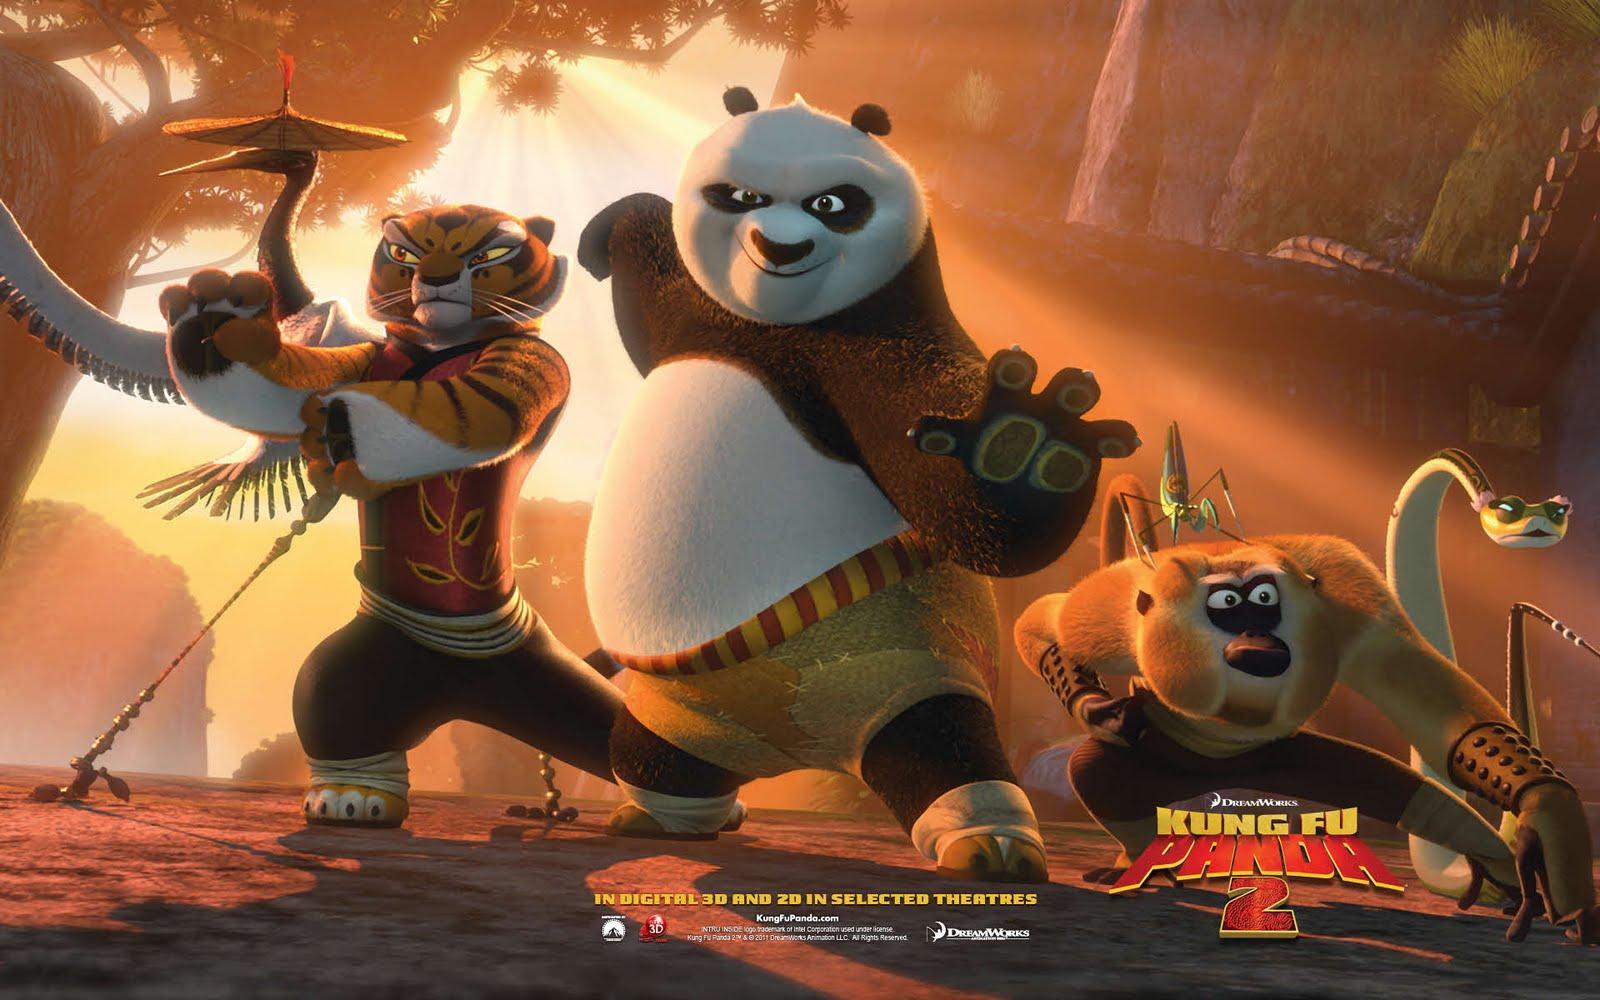 http://1.bp.blogspot.com/-WRlVvduRvmo/TkNuTkpdEbI/AAAAAAAAC5A/CIzjqz332HQ/s1600/Kungfu-Panda-2-Wallpaper-4.jpg